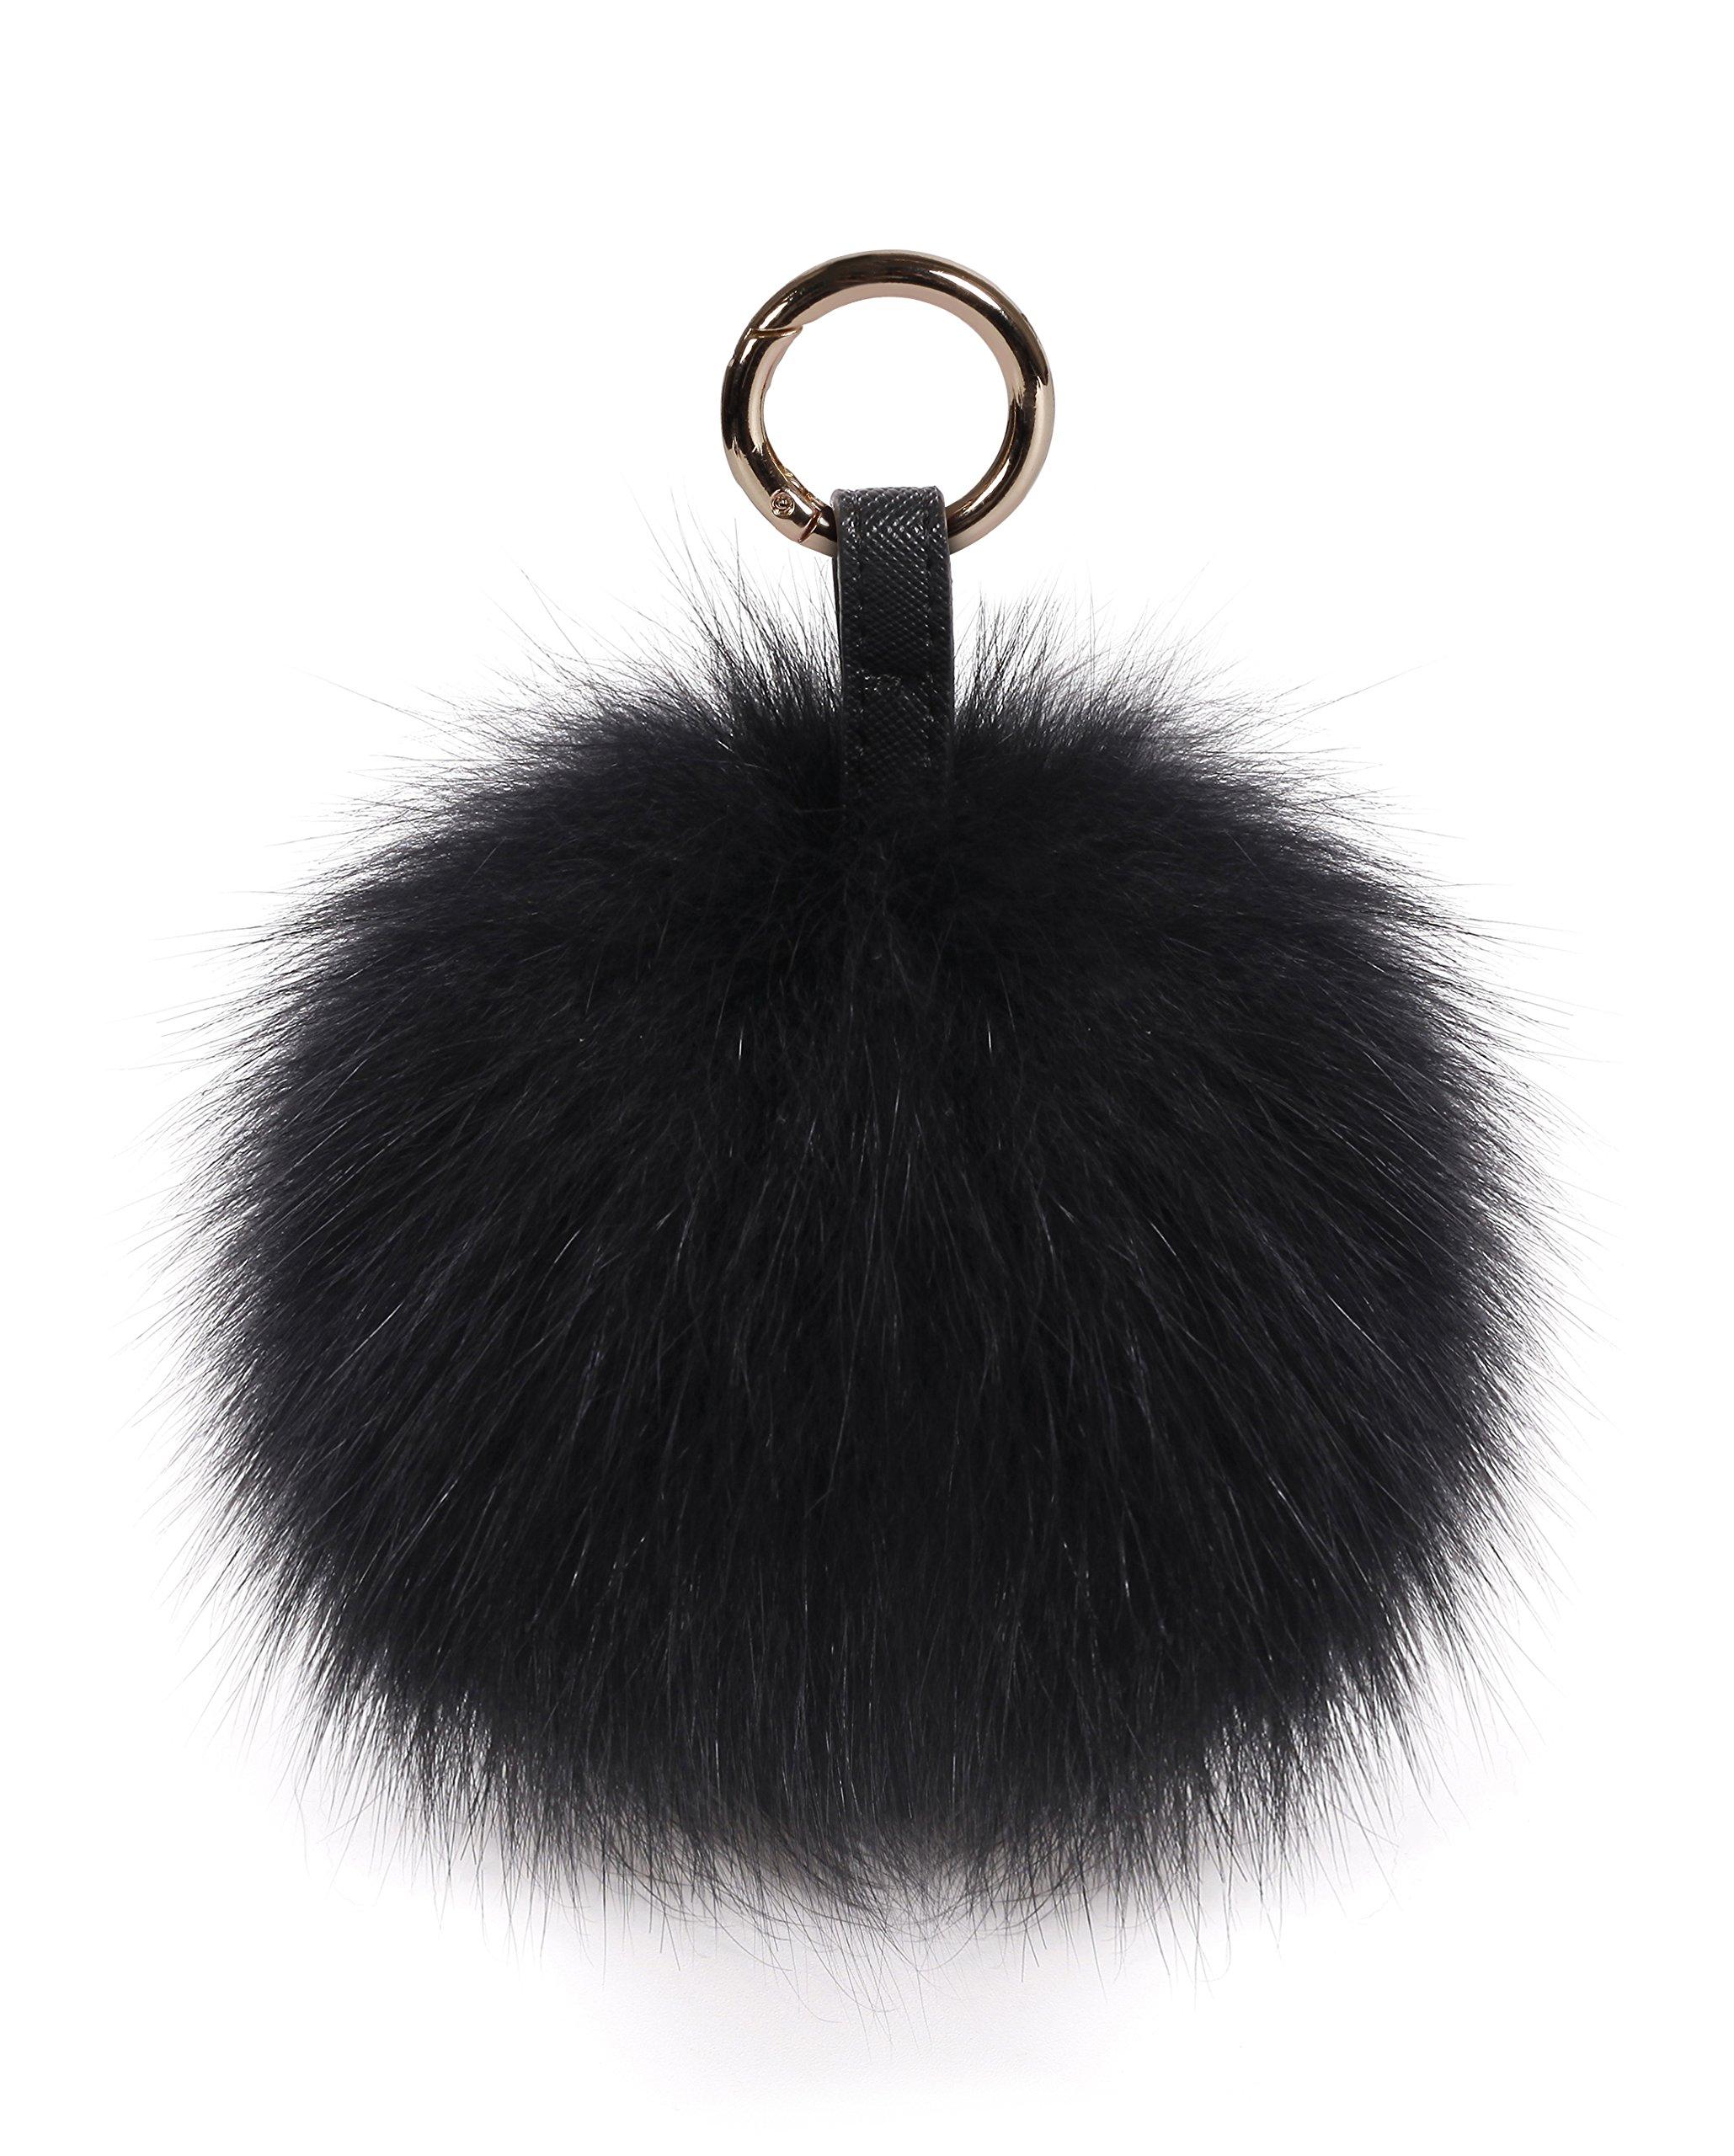 S.ROMZA Pom Pom Keychain Fluffy Real Fox Fur Ball Keychain for Women Bag Purse car key Charms